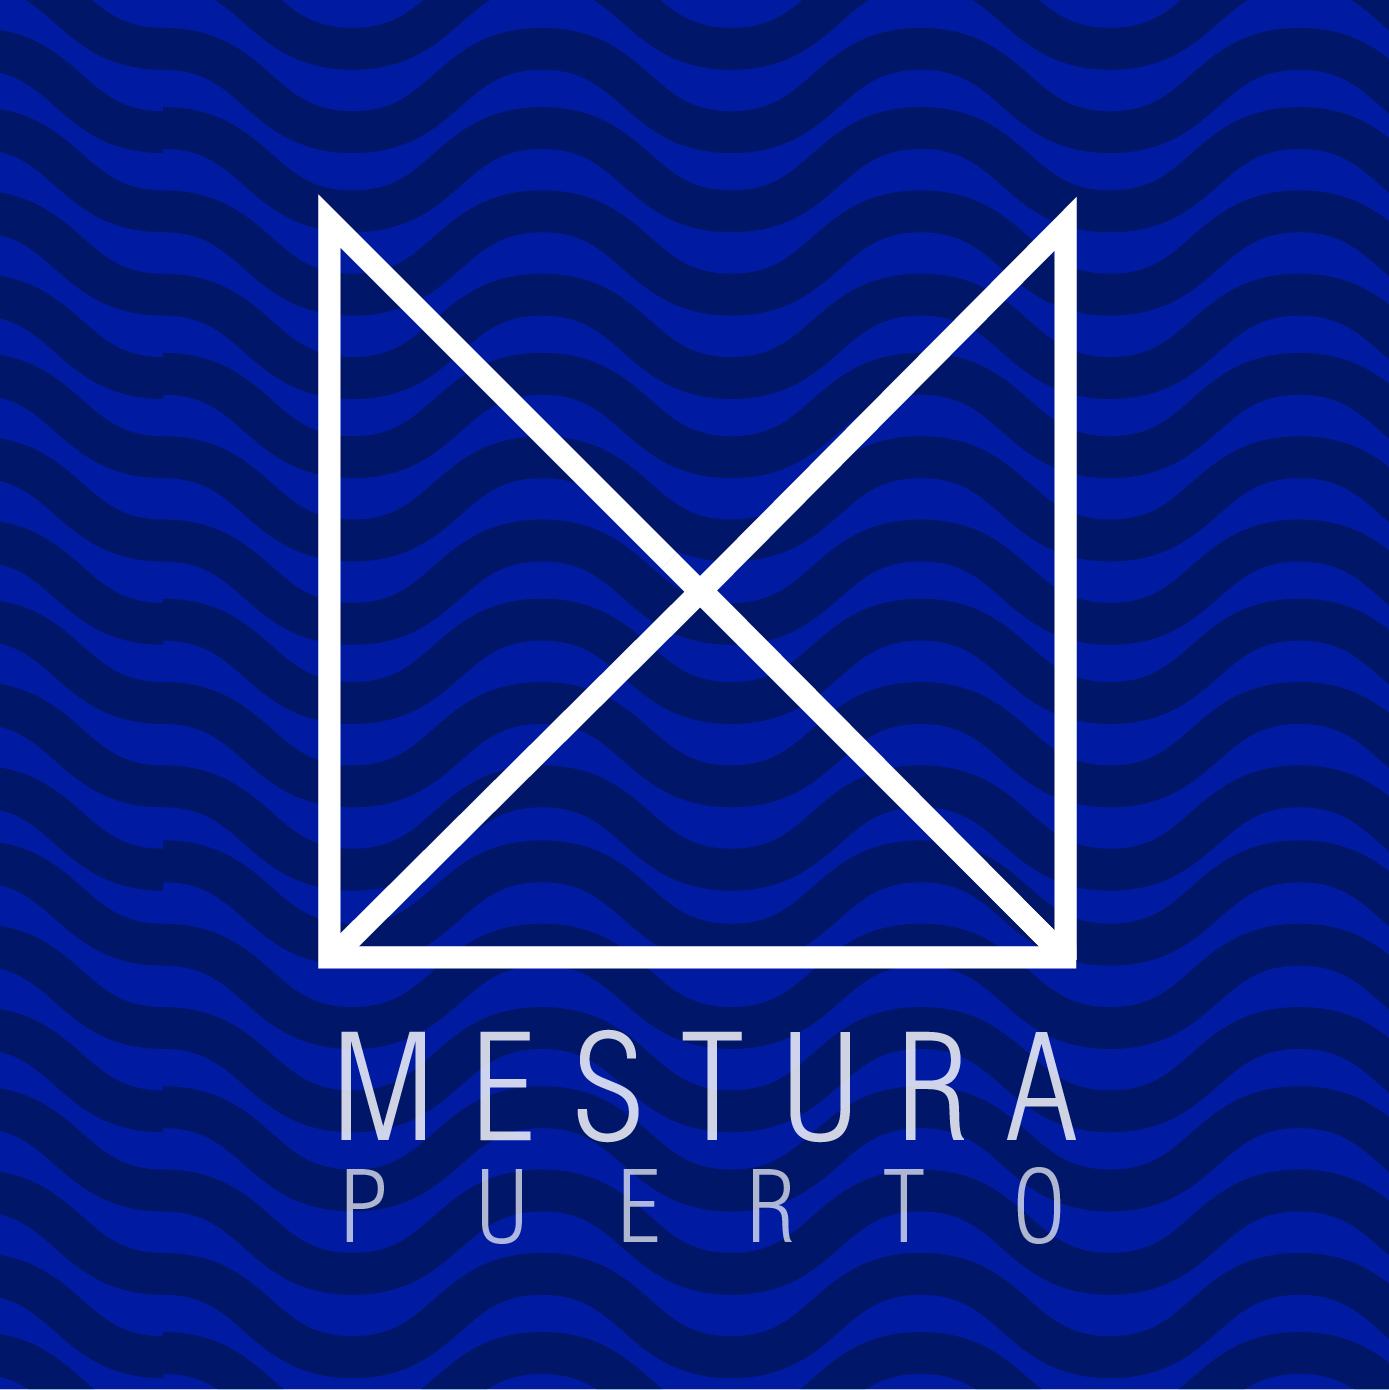 logotipo-familias/172108_Mestura-13.jpg